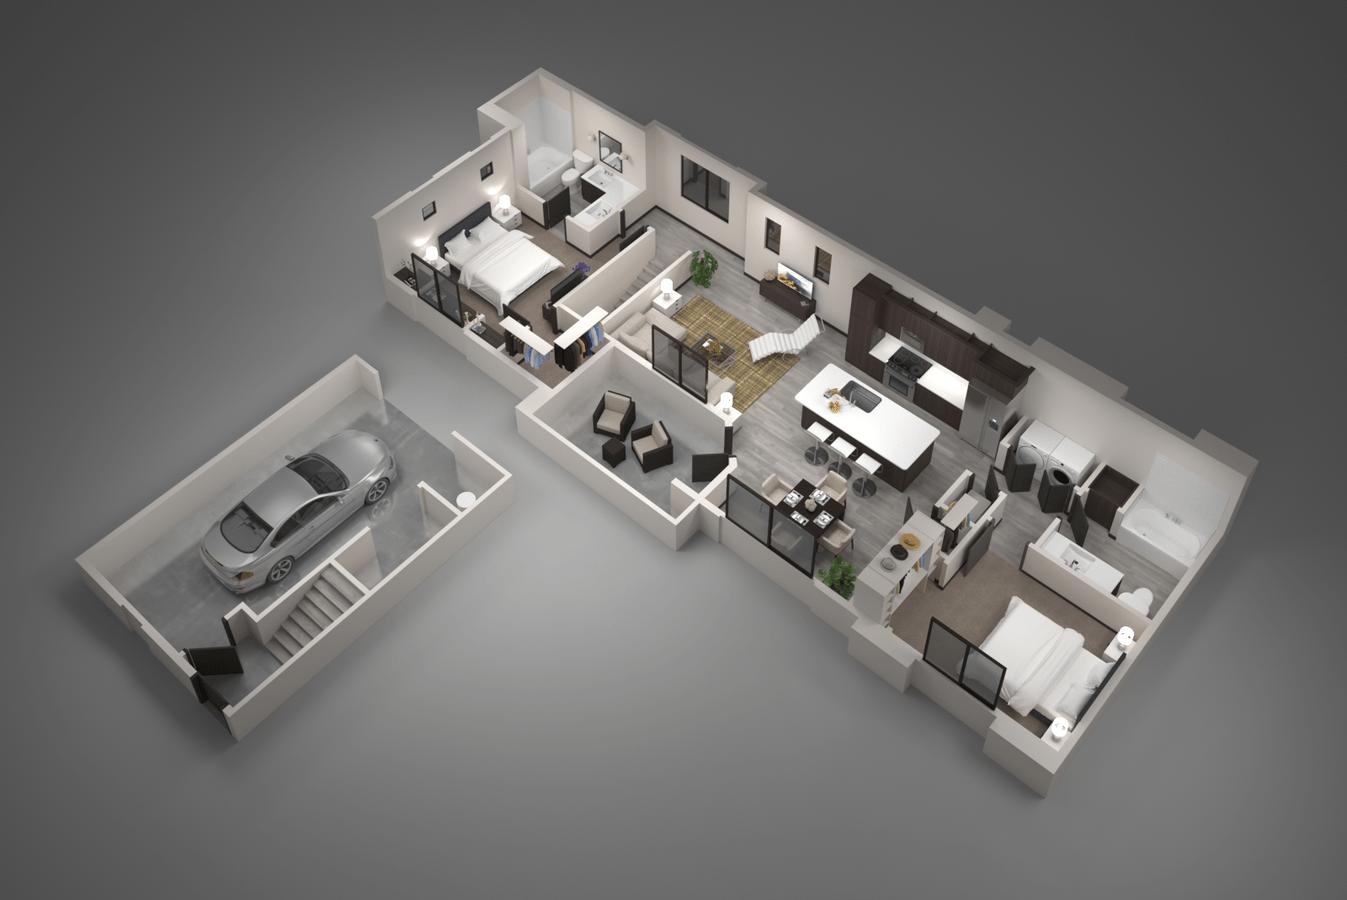 2 Bedrooms 2 Bathrooms Apartment for rent at Aviva in Mesa, AZ